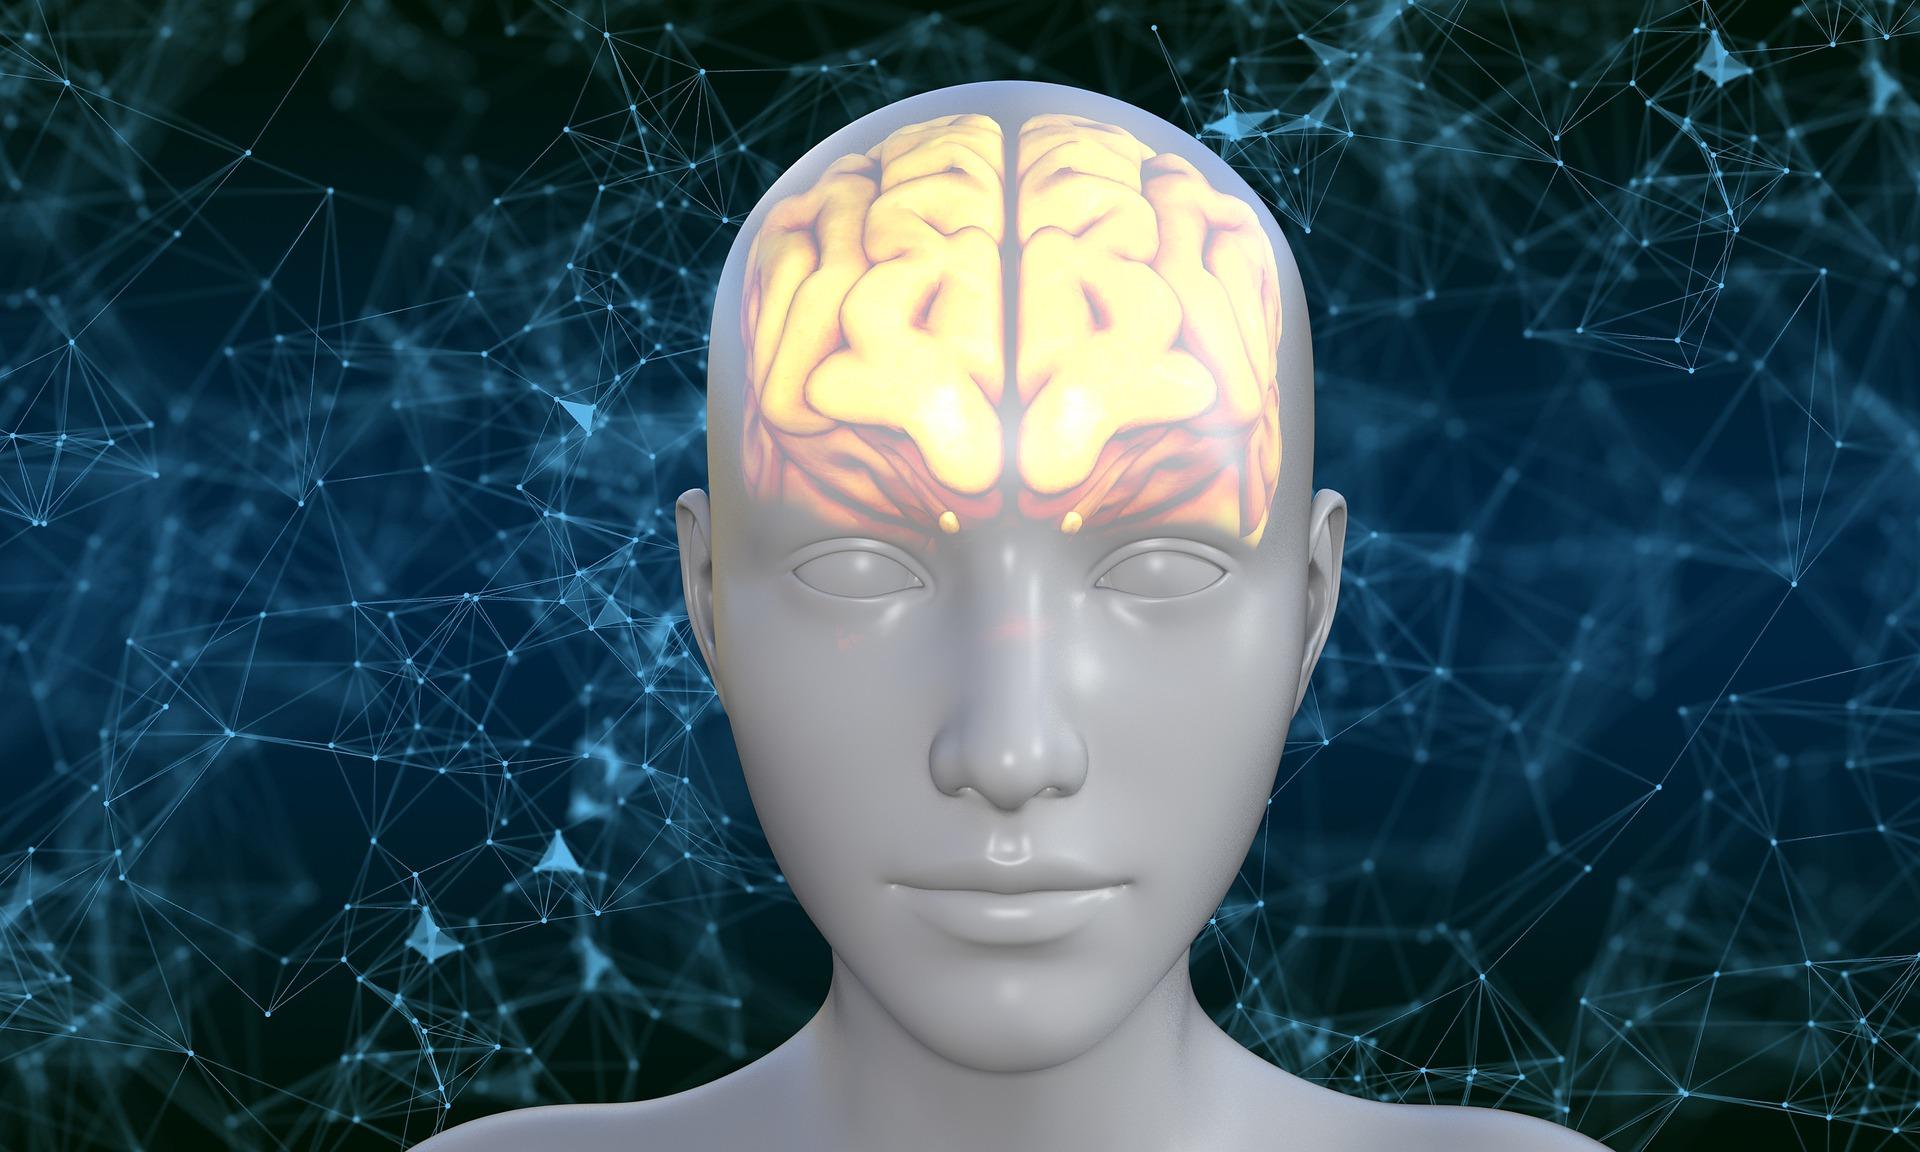 Creierul uman si capacitatea de adaptare